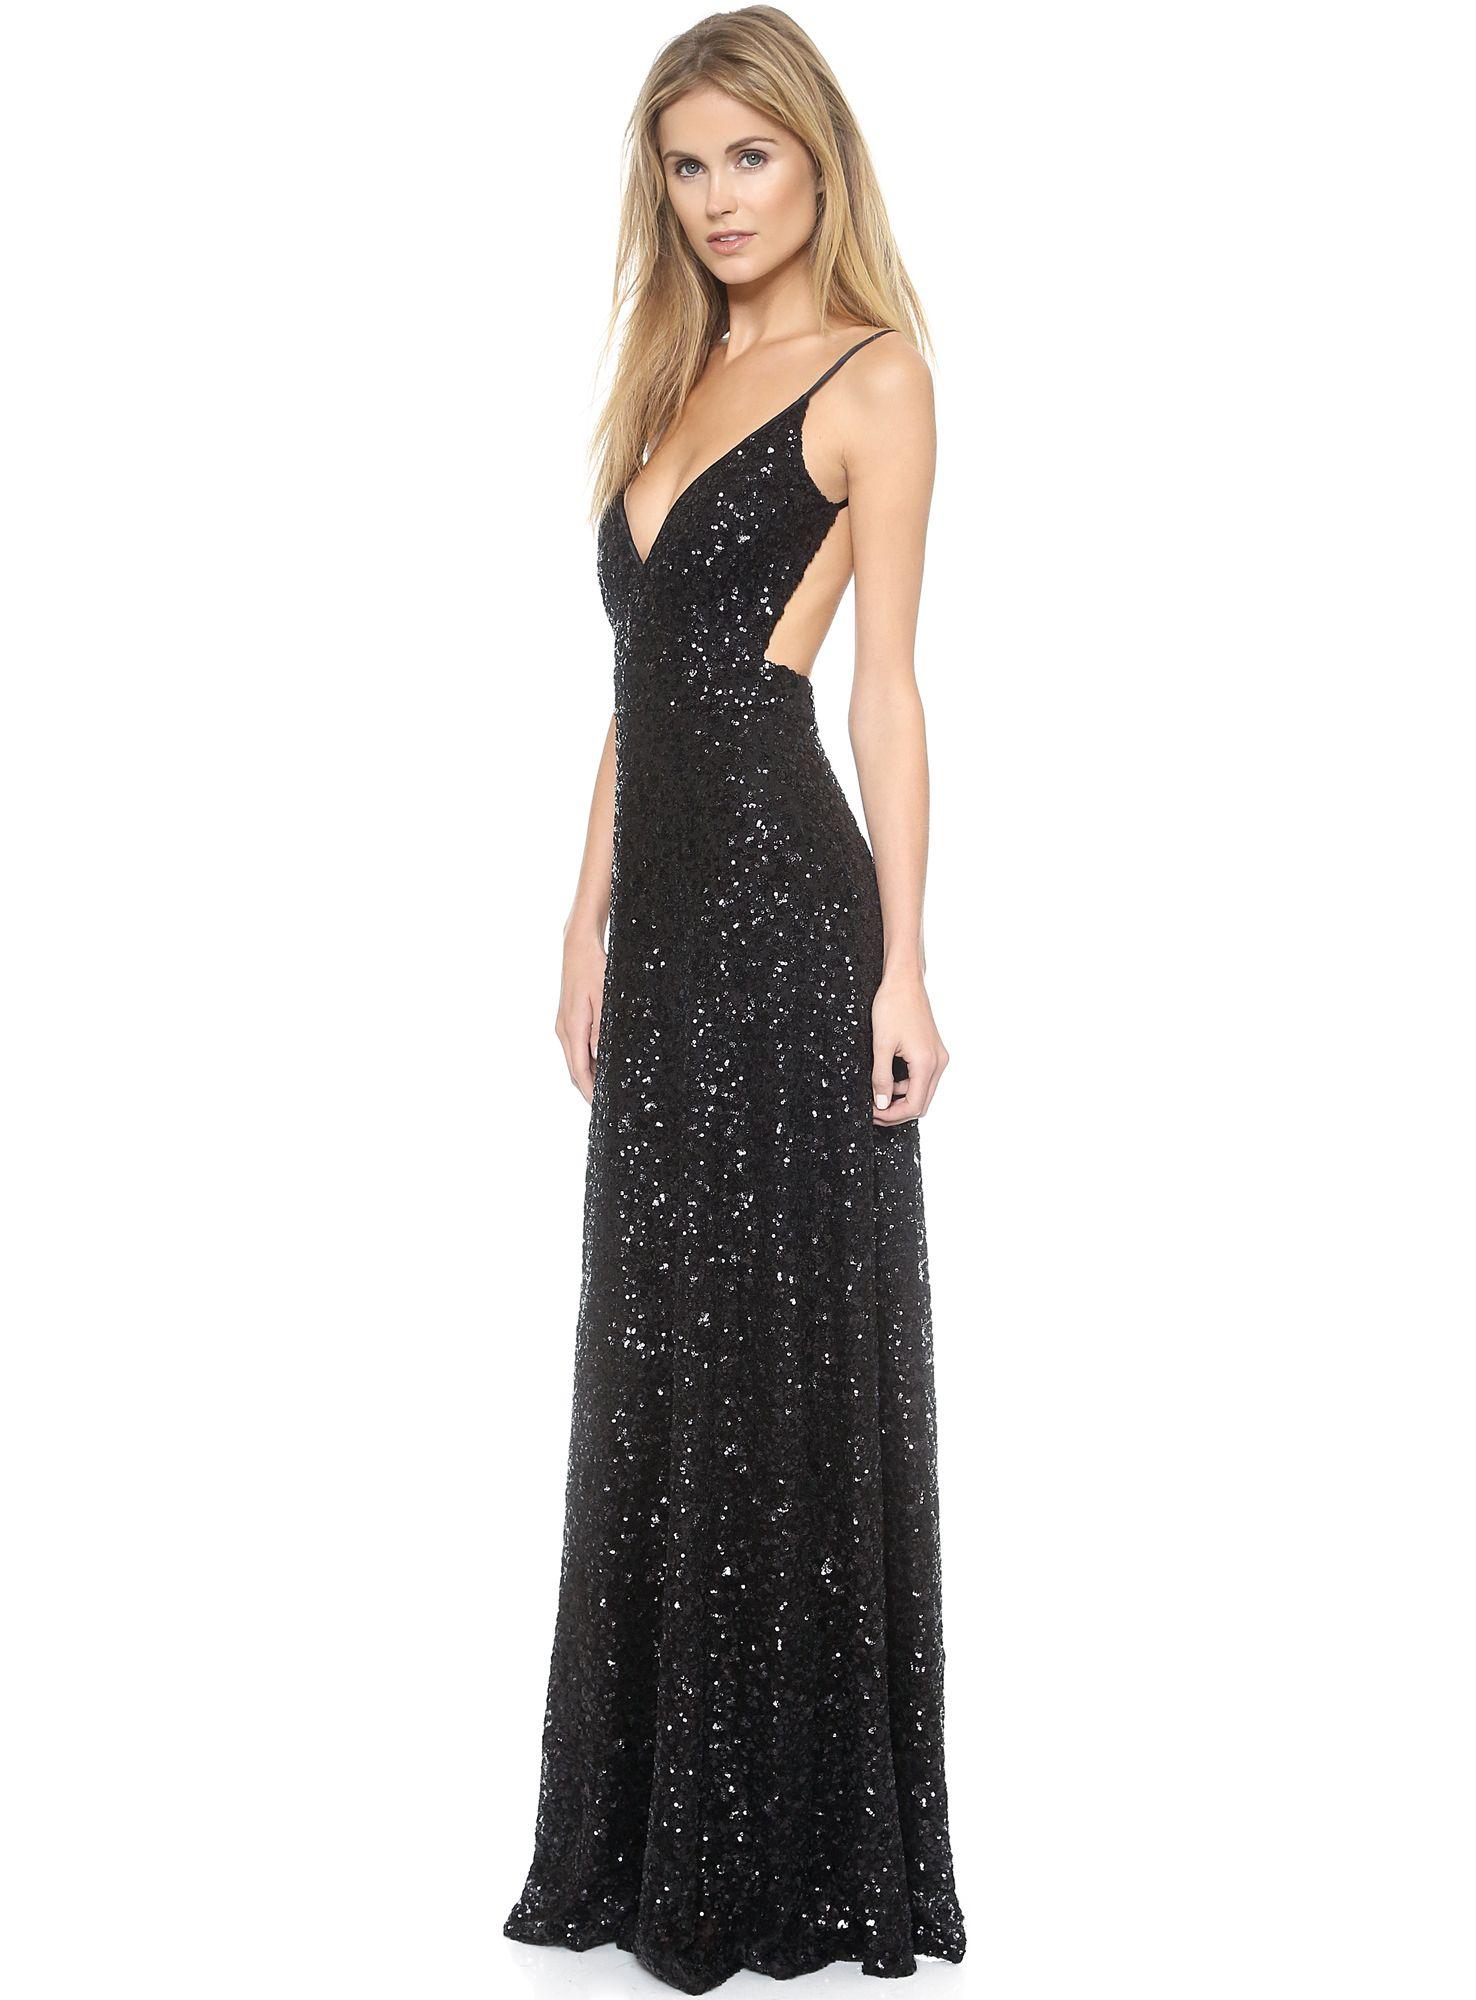 Vestido Maxi lentejuelas-negro | Cosas para comprar | Pinterest ...